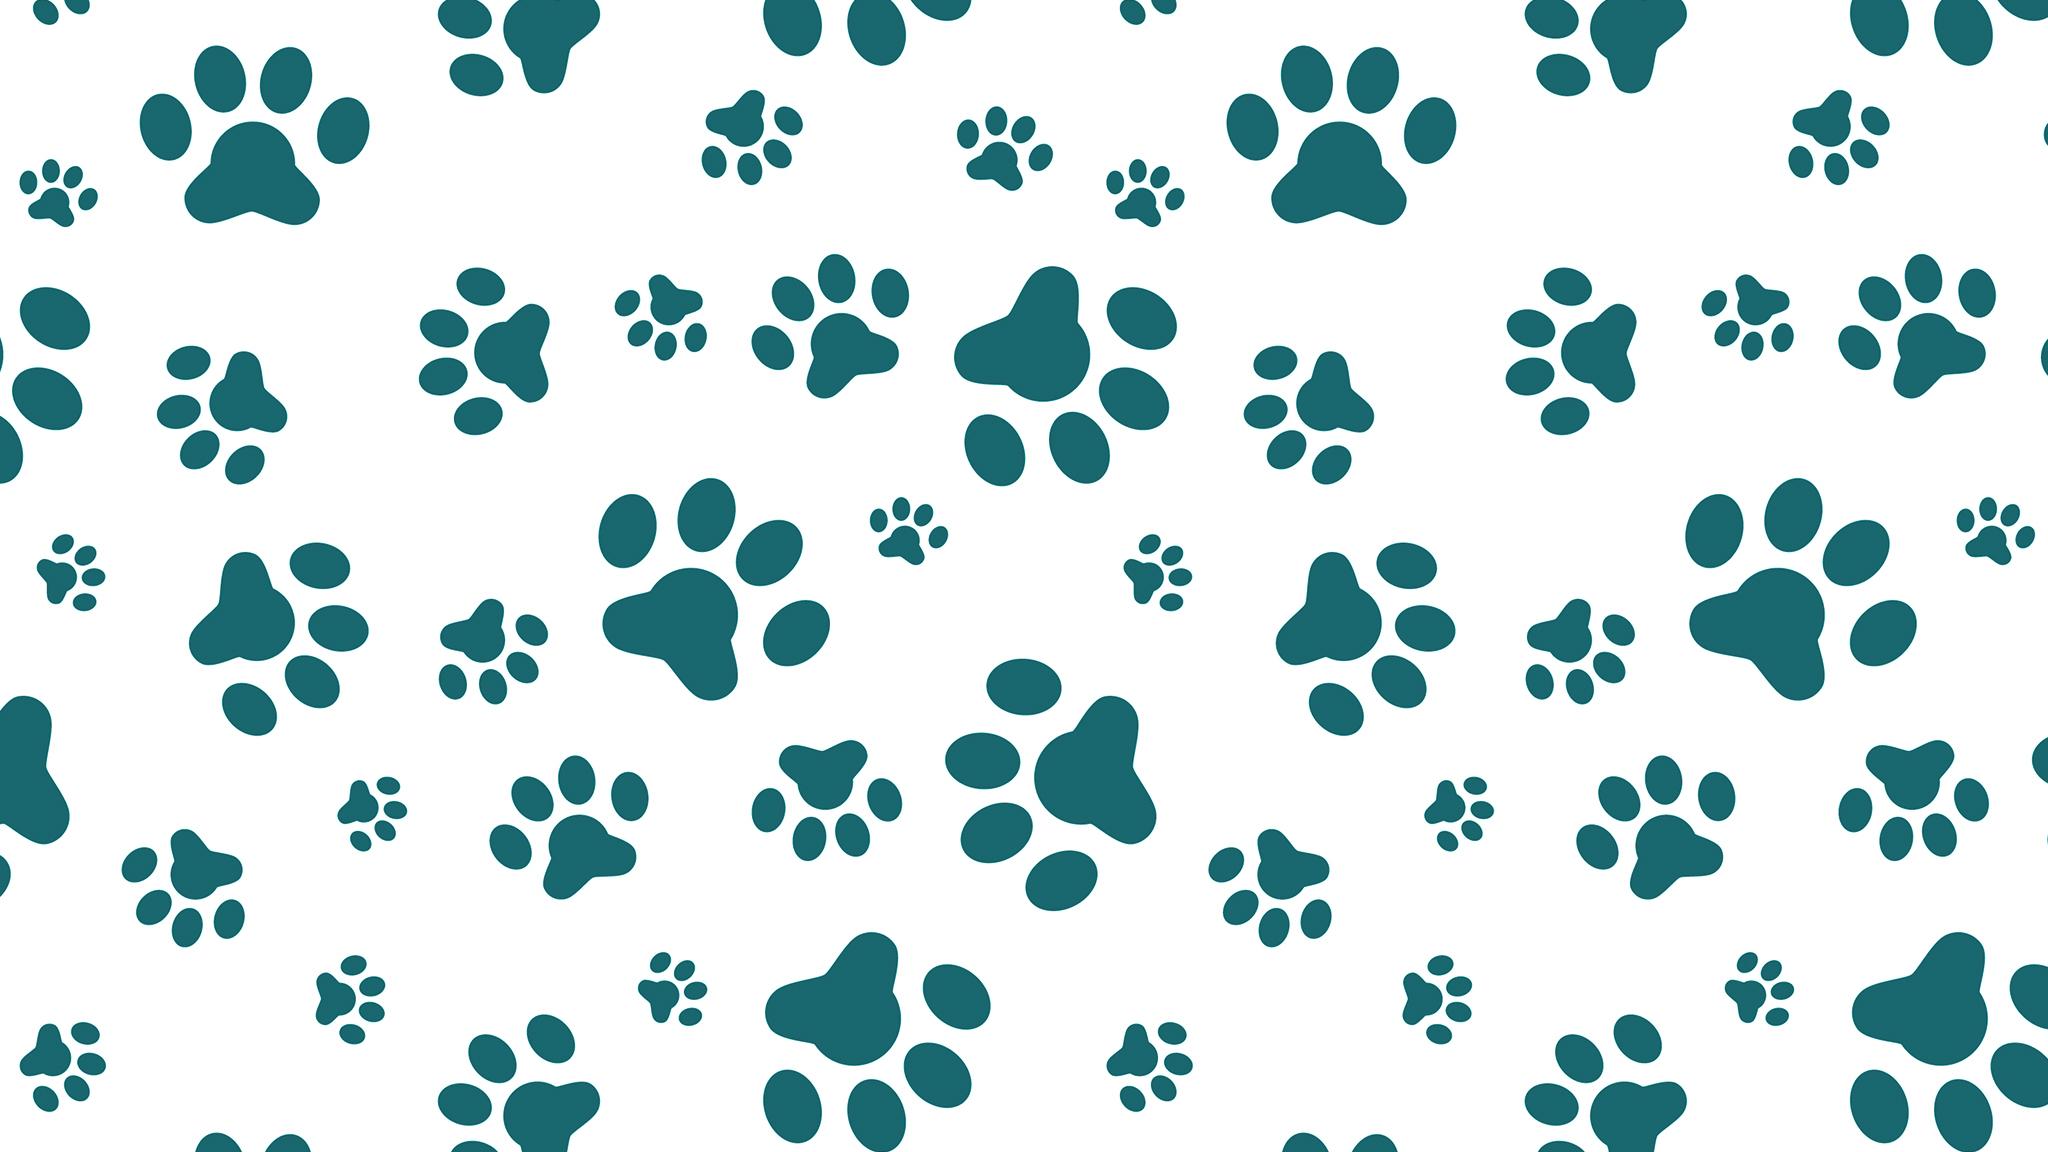 Pawprint Background - Janesville Veterinary Clinic